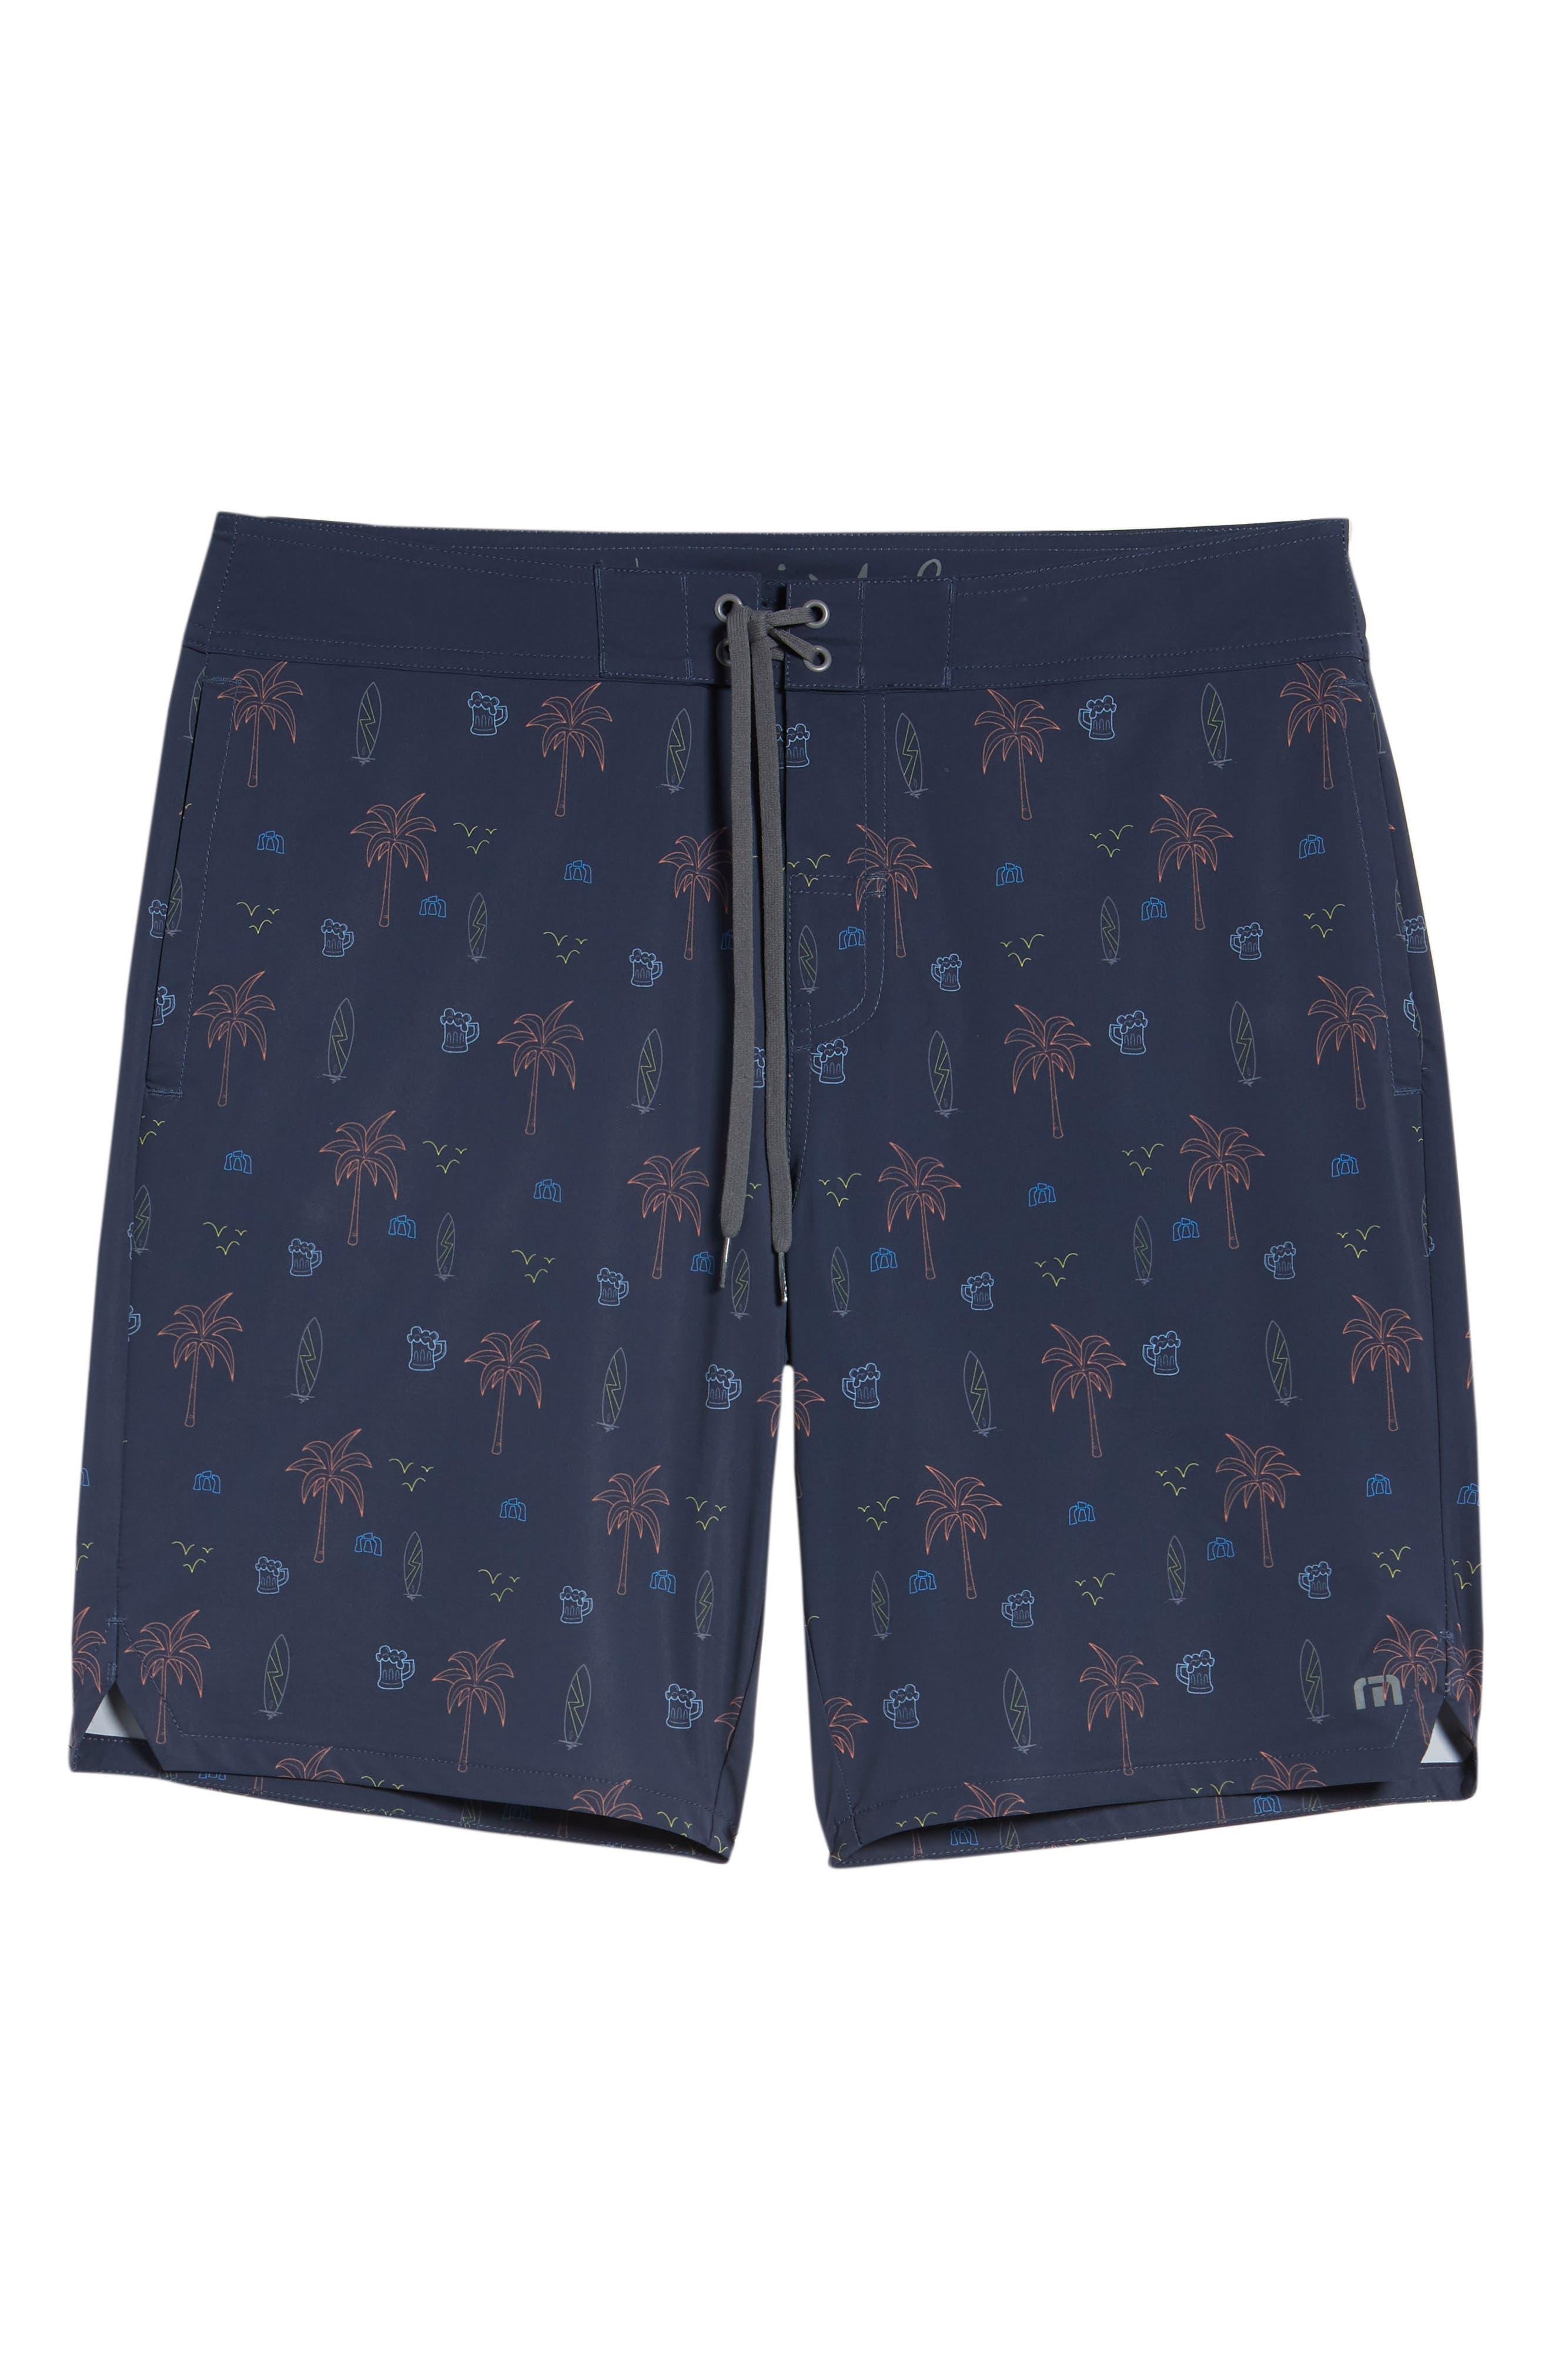 Safari Regular Fit Board Shorts,                             Alternate thumbnail 6, color,                             400